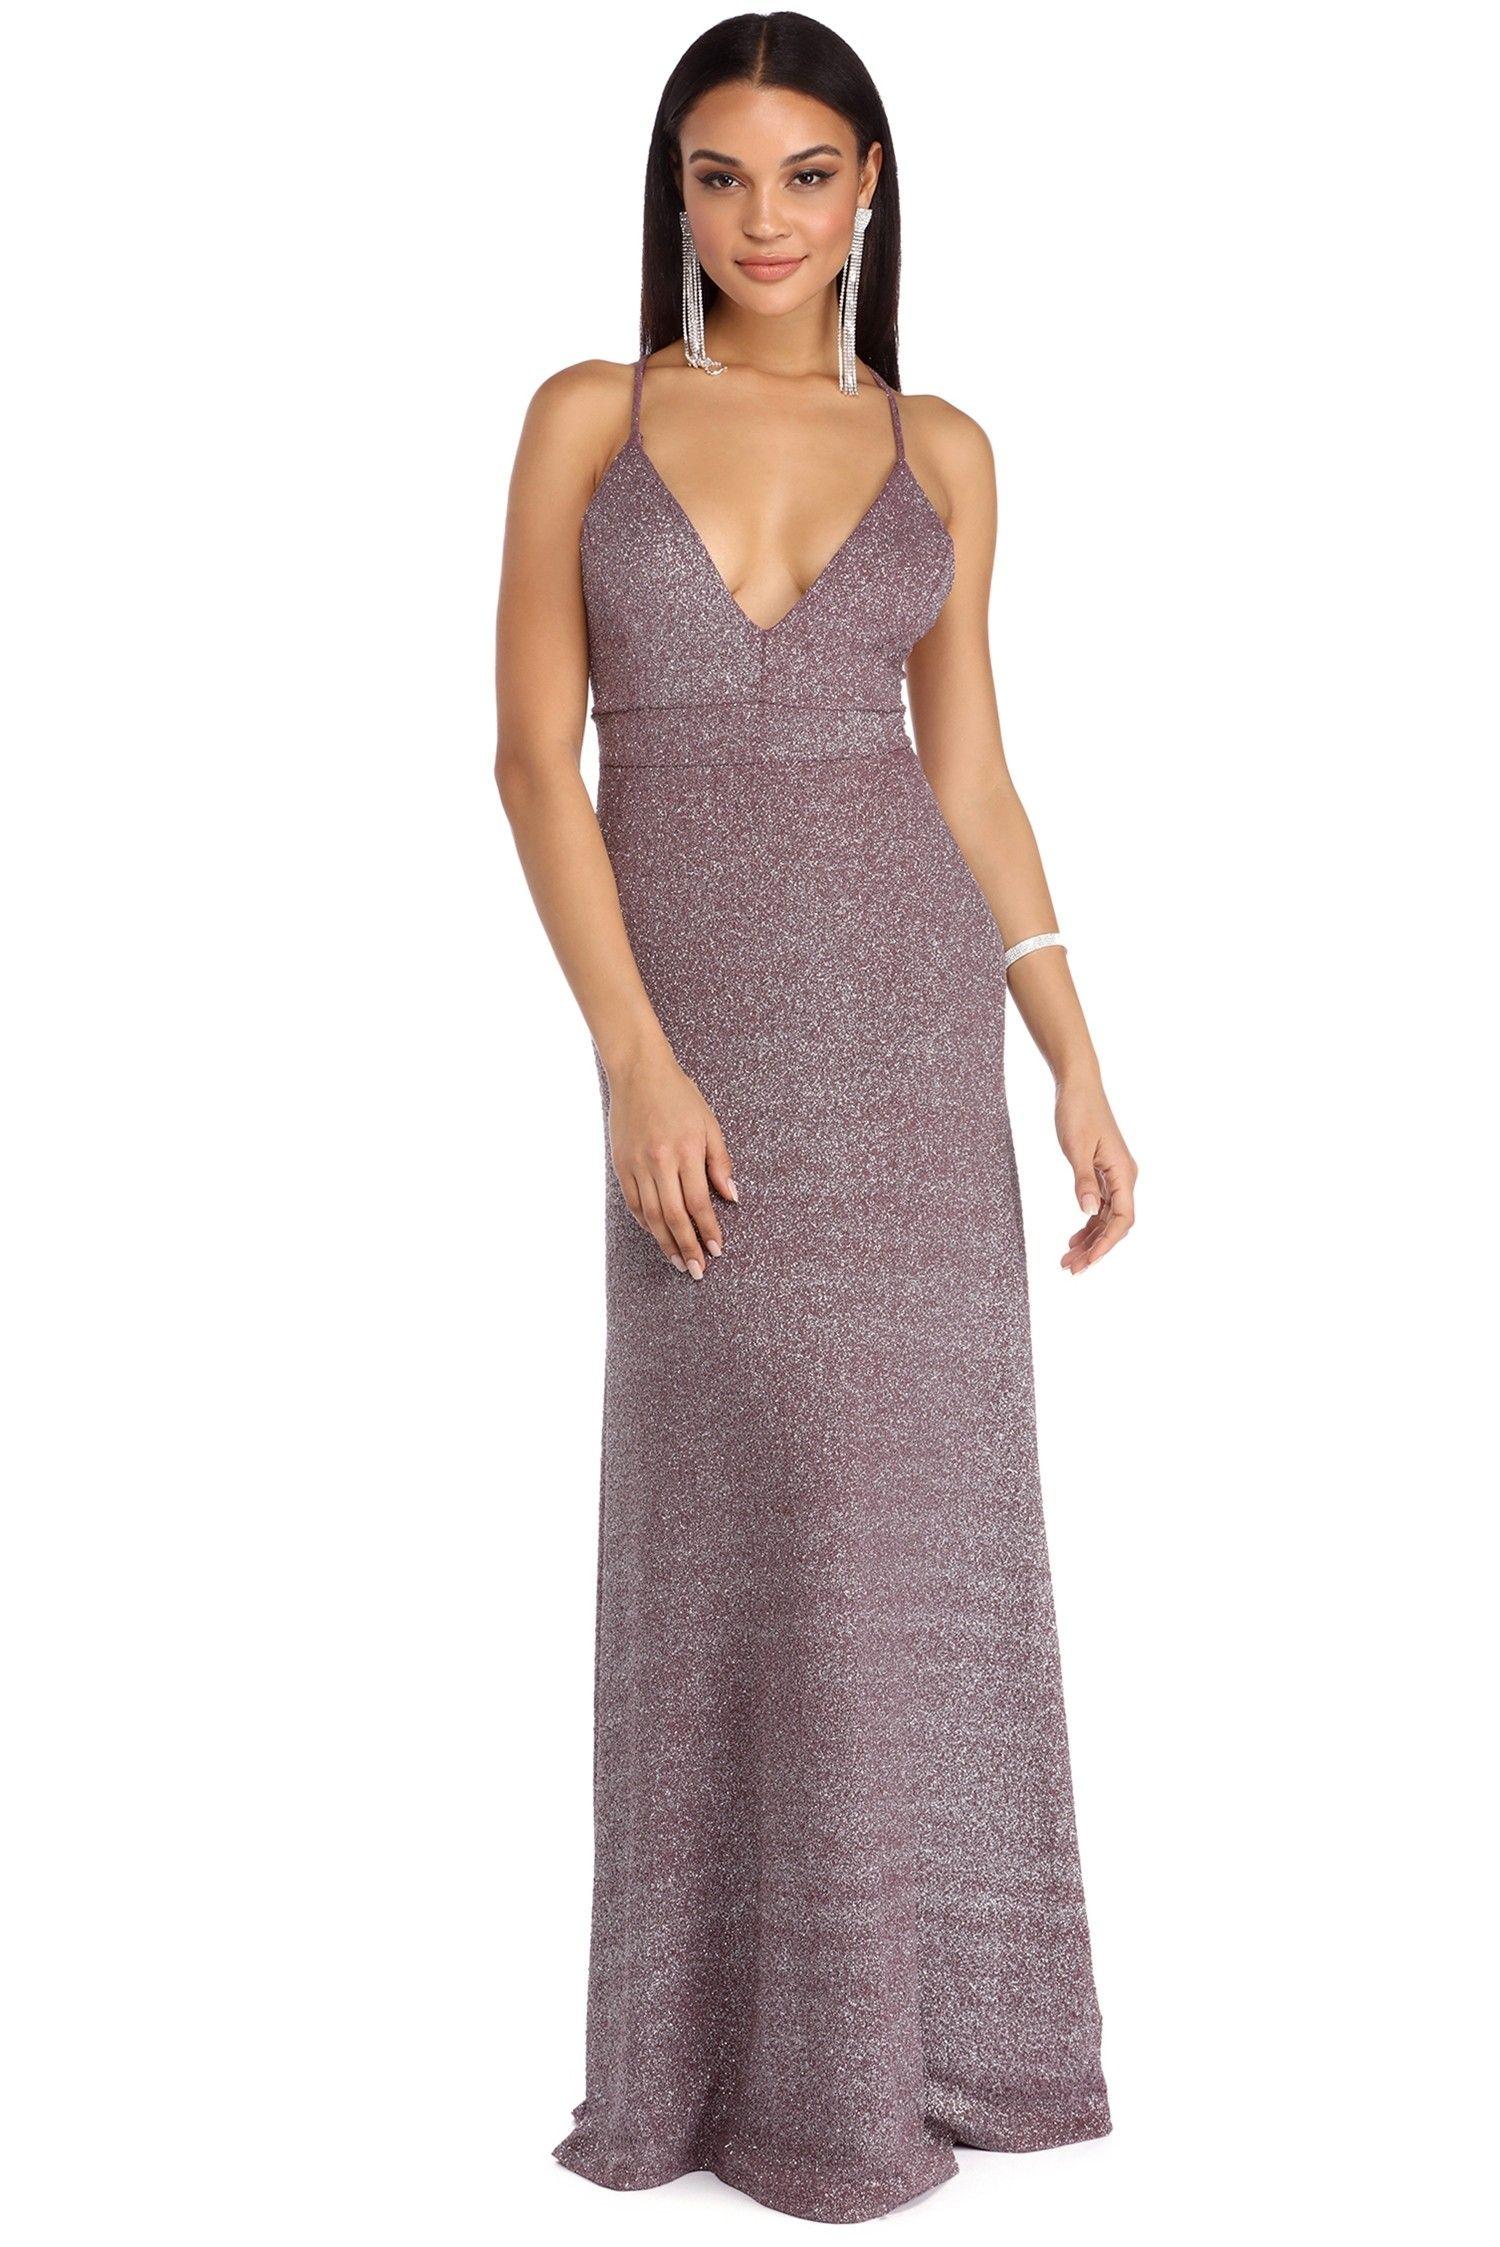 Jordana lavender plunging glitter dress lavender red carpet and